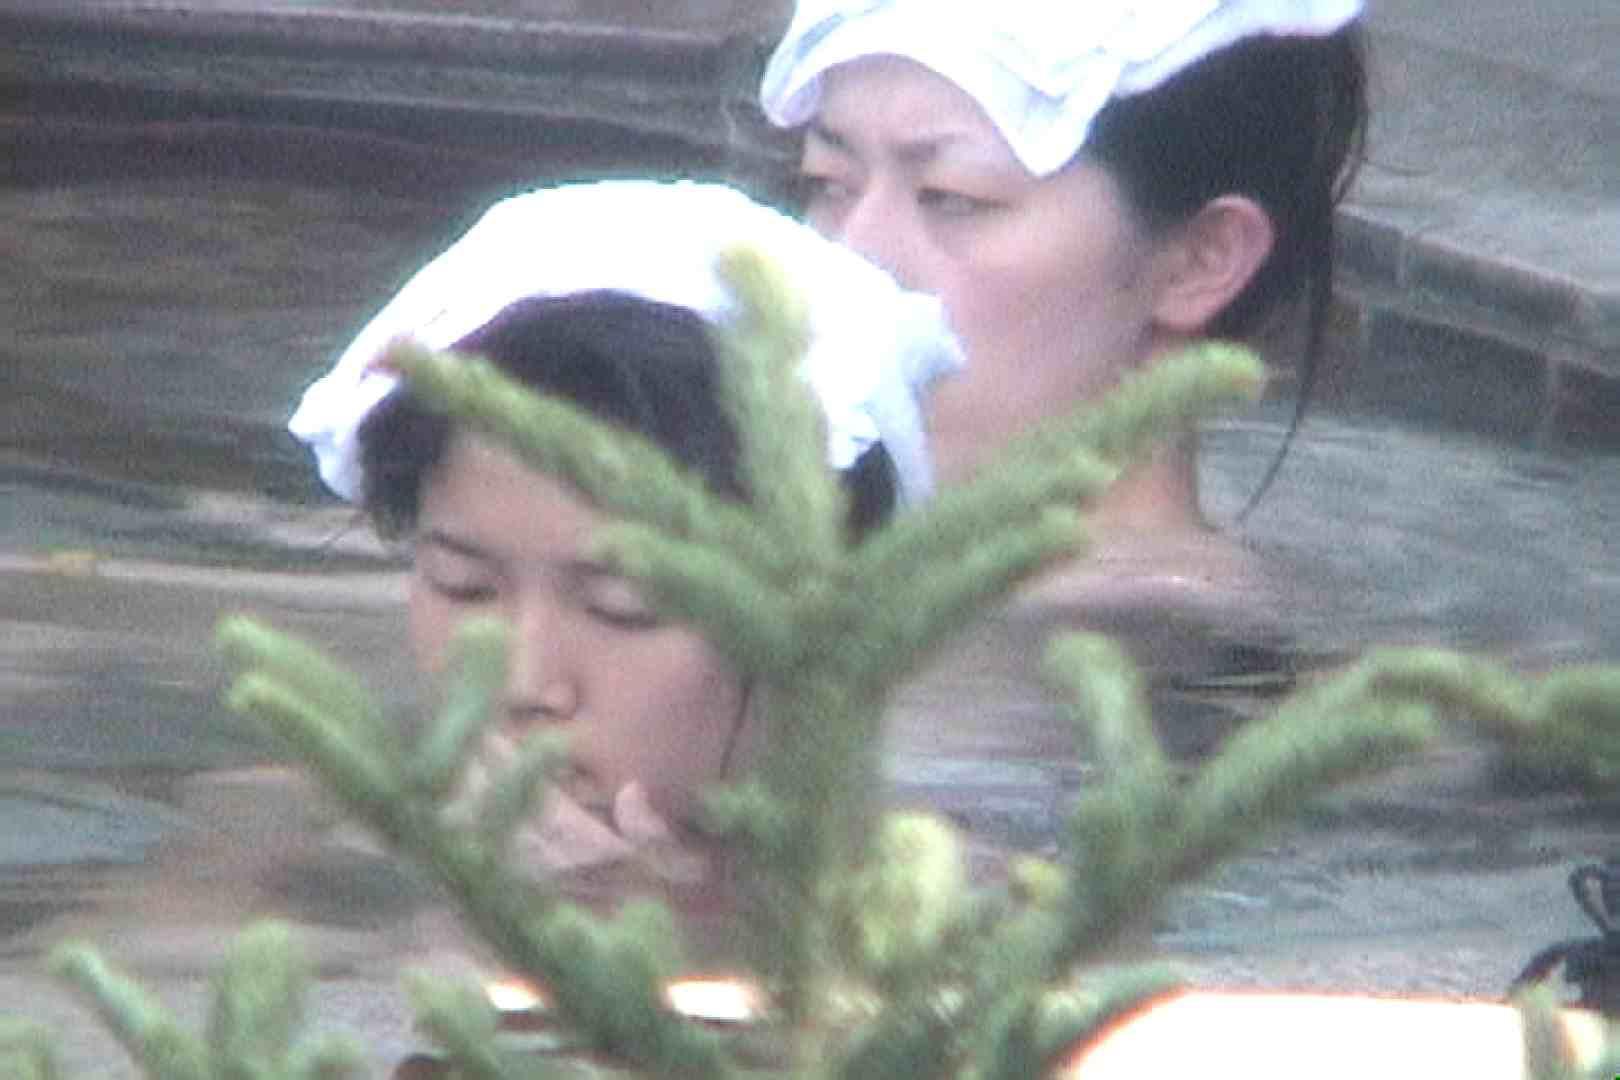 Aquaな露天風呂Vol.80【VIP限定】 盗撮 | HなOL  66pic 56